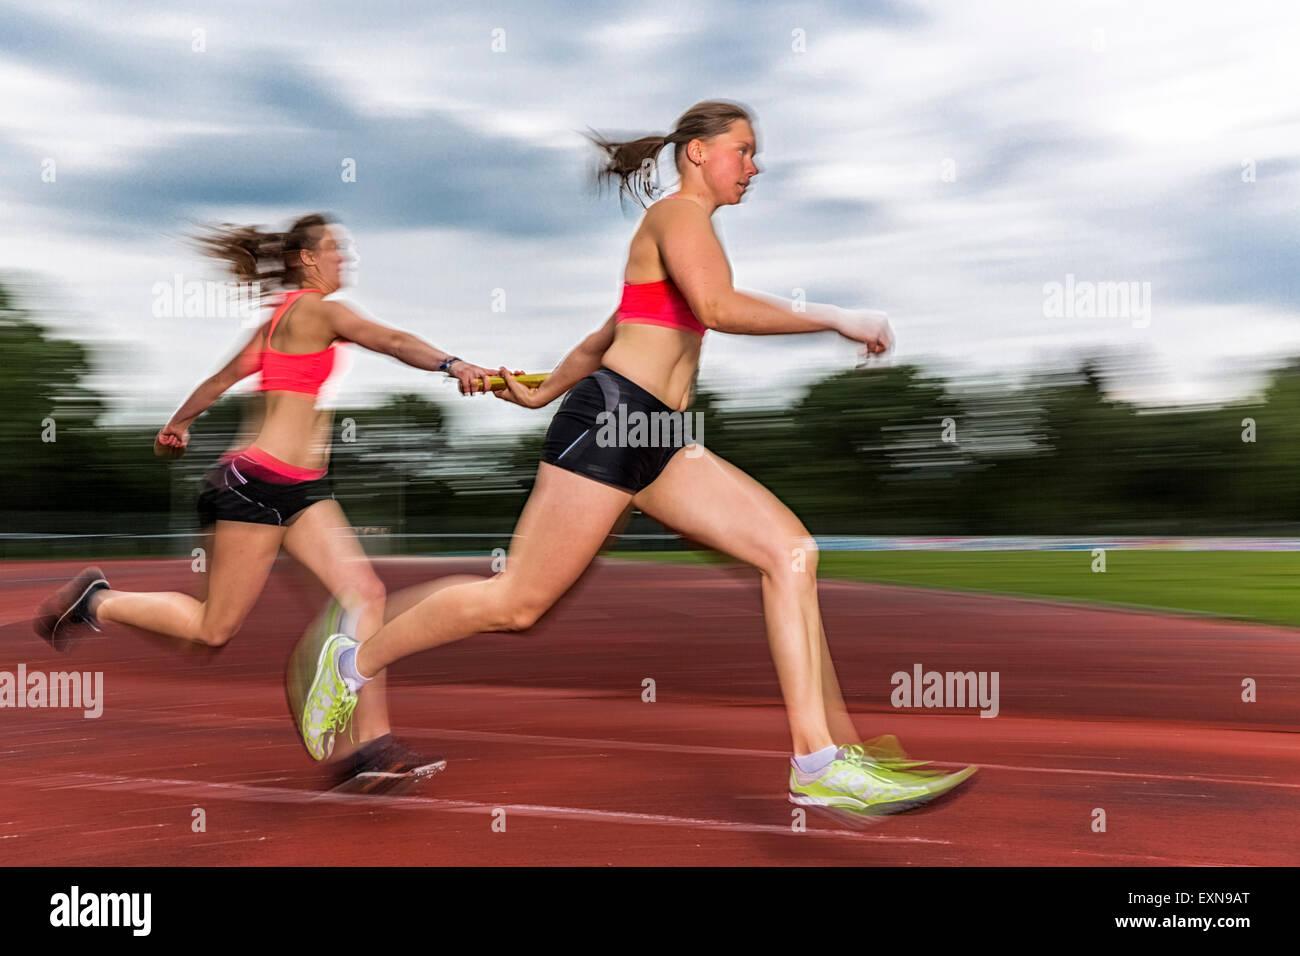 Two sprinters passing the baton - Stock Image